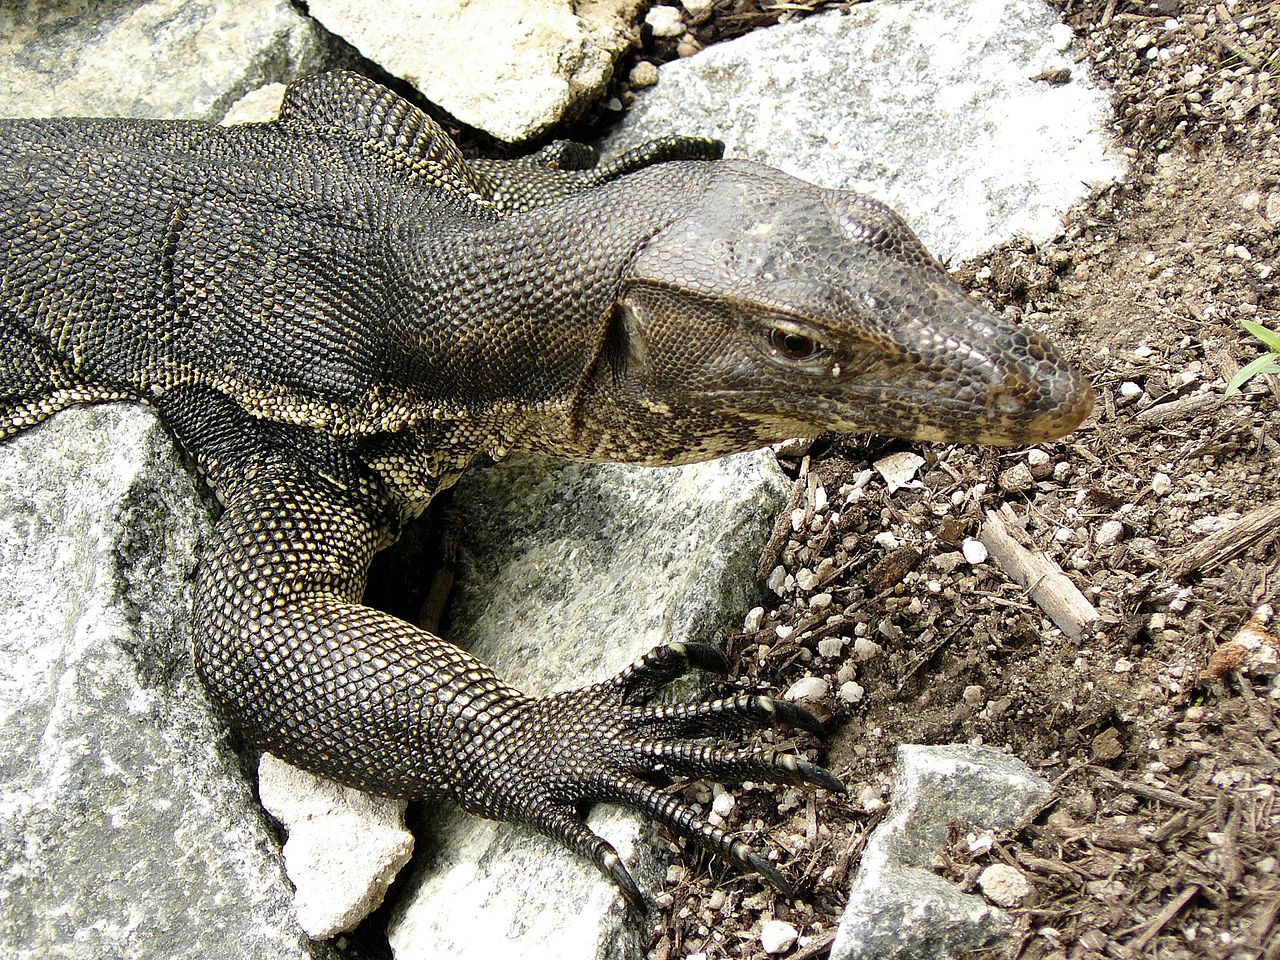 File:Monitor Lizard, Sungei Buloh Wetlands Reserve ...